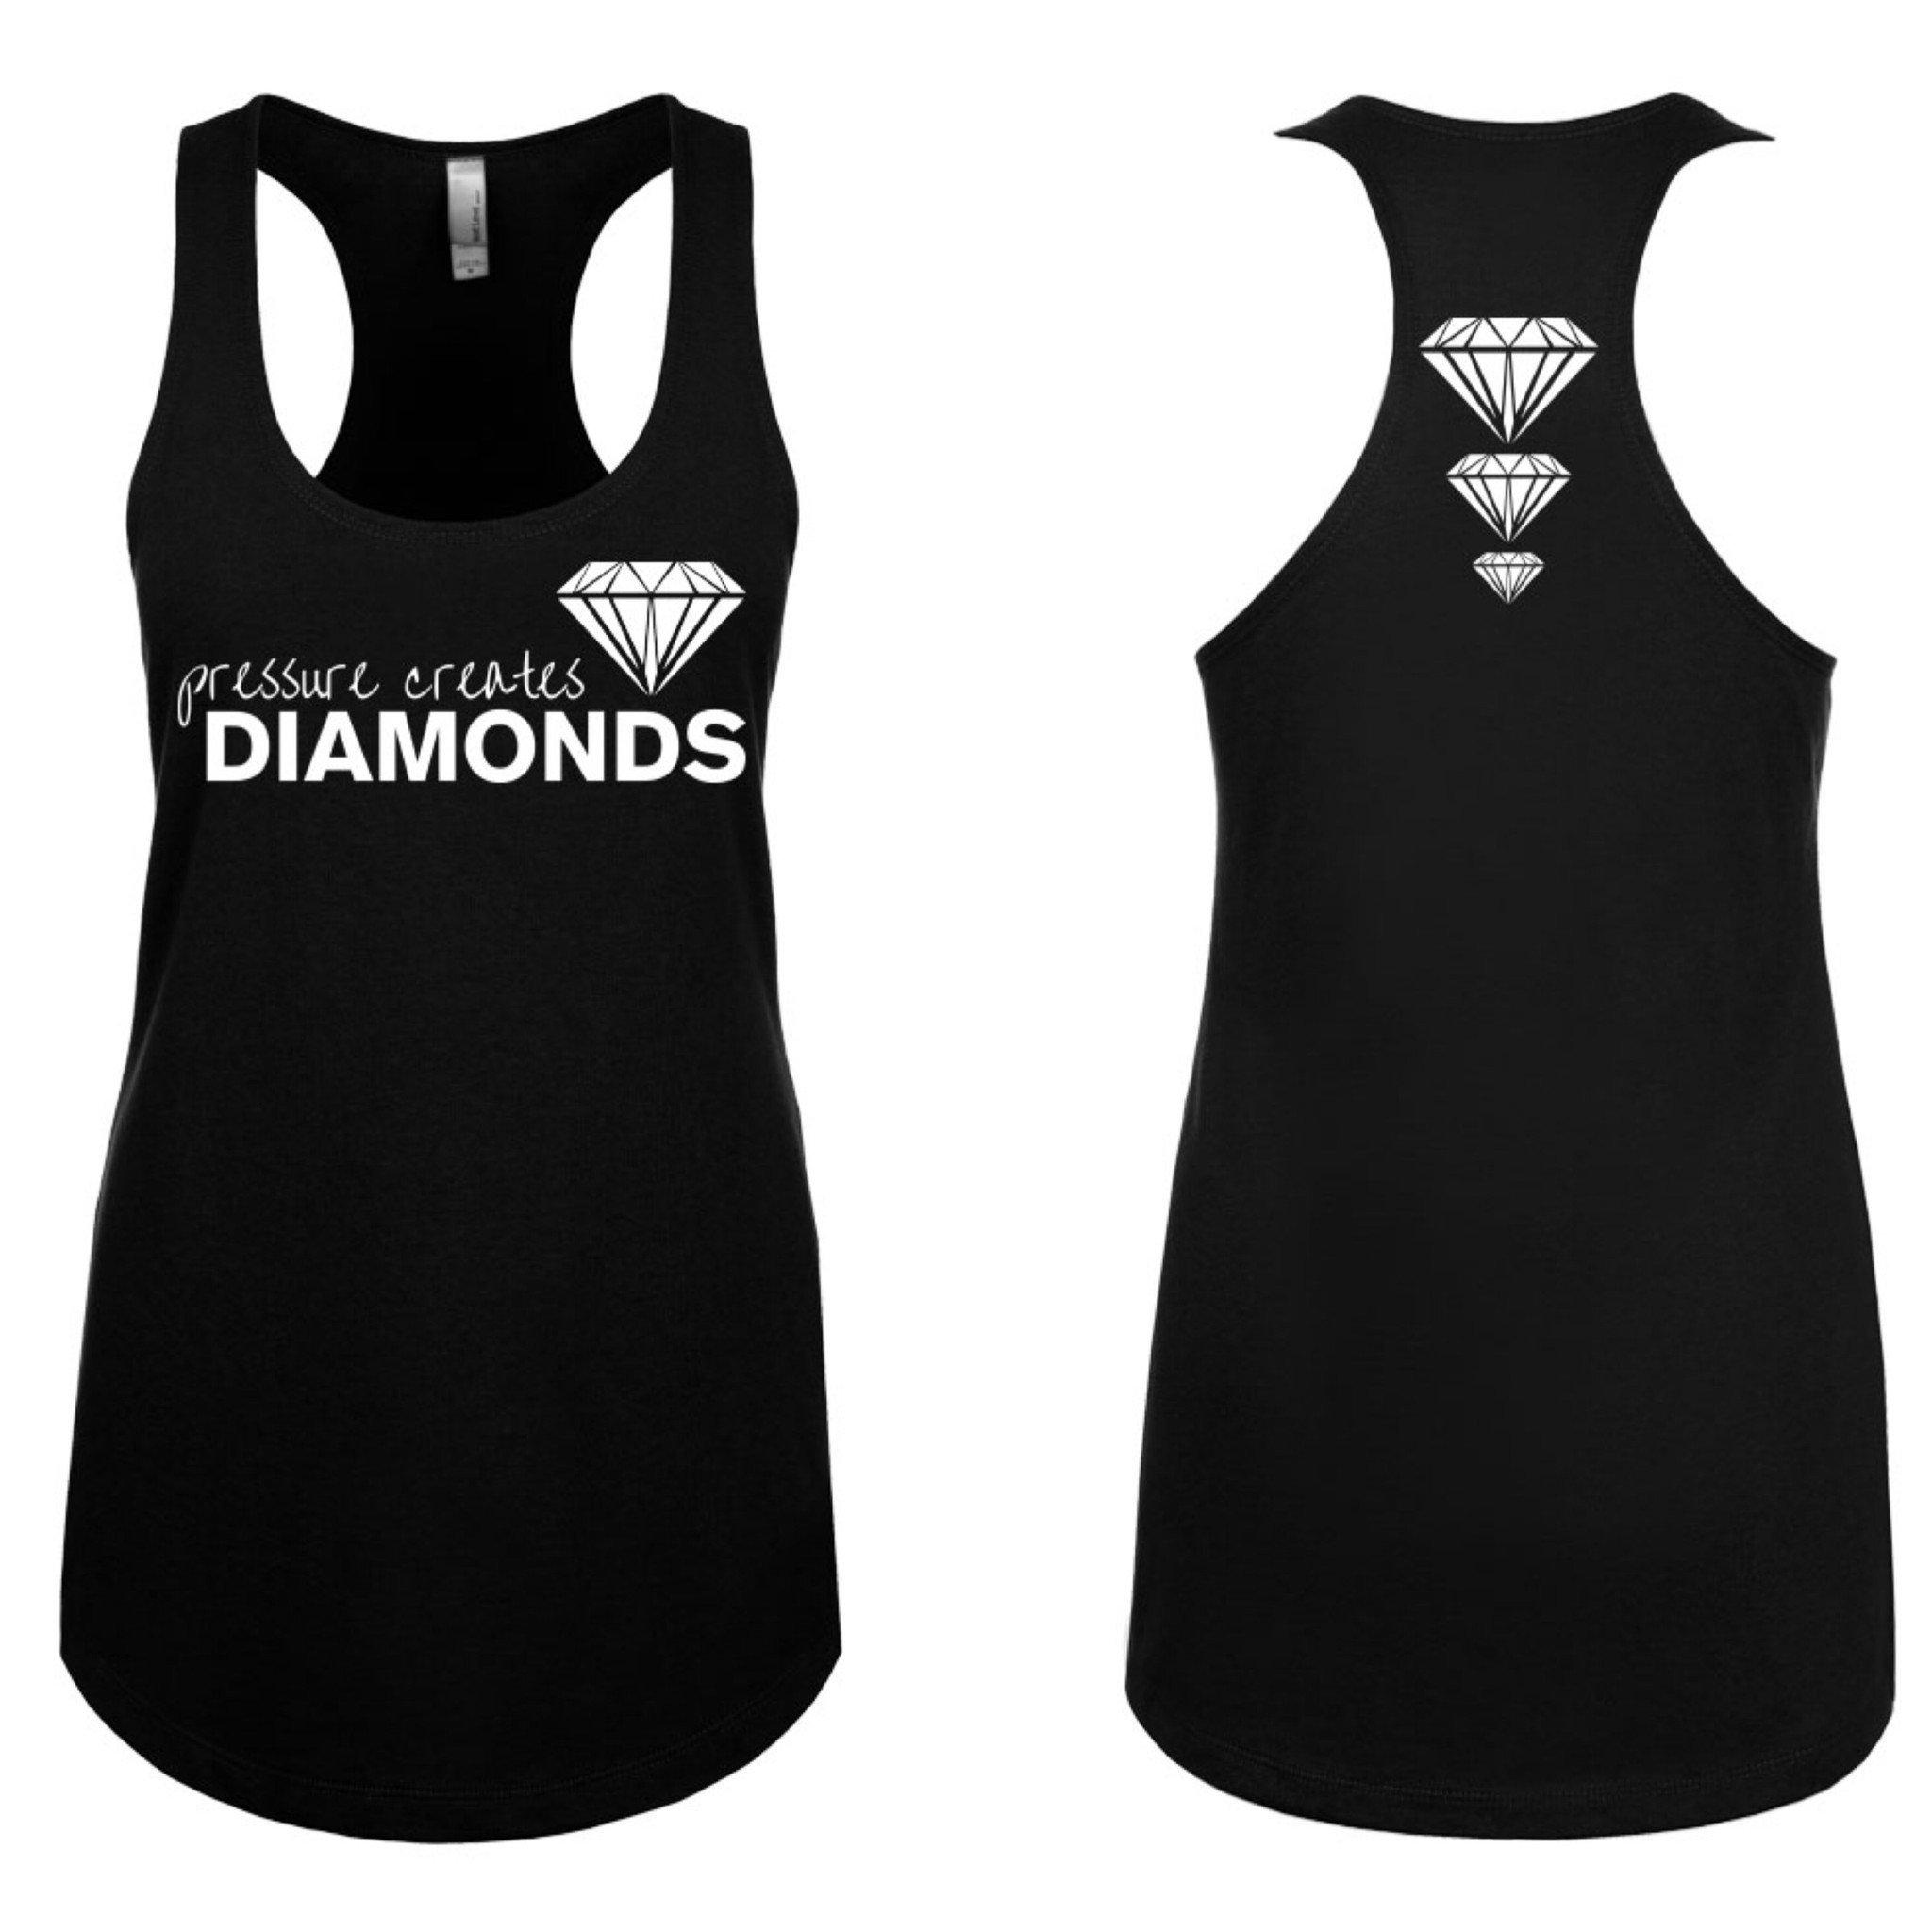 Pressure Creates Diamonds Black Tanktop